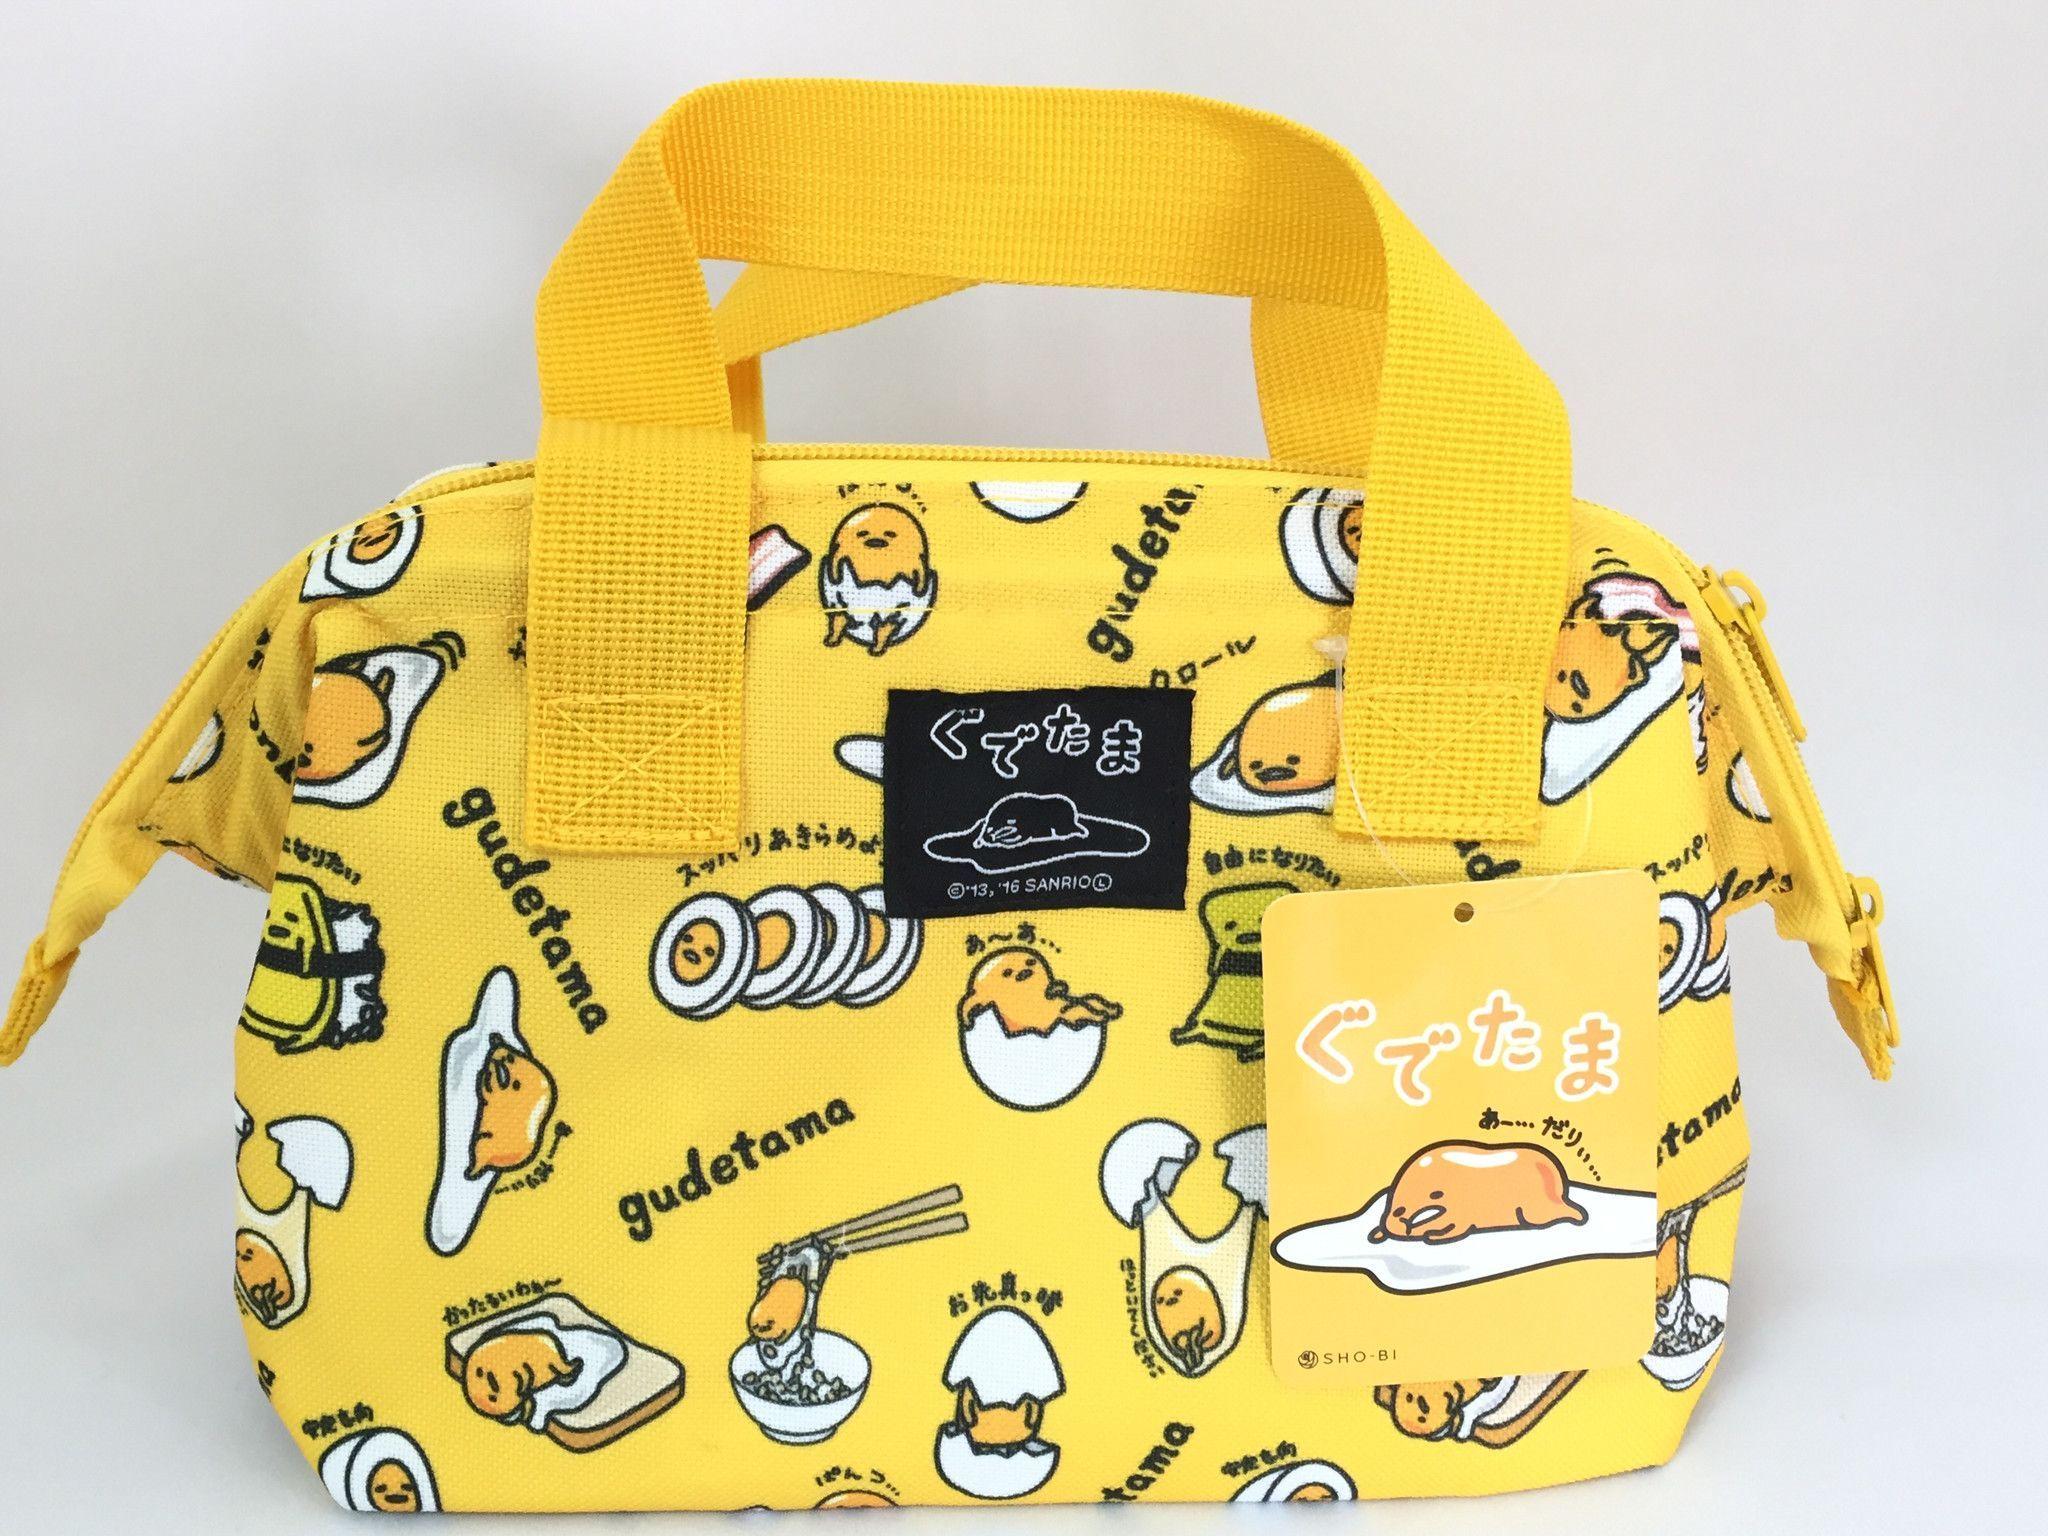 8ebe0ff1c8 SANRIO Gudetama Wire Cooler Tote Bag For Lunch Tote Food Bento Box From  Japan Gi bag Belt handle